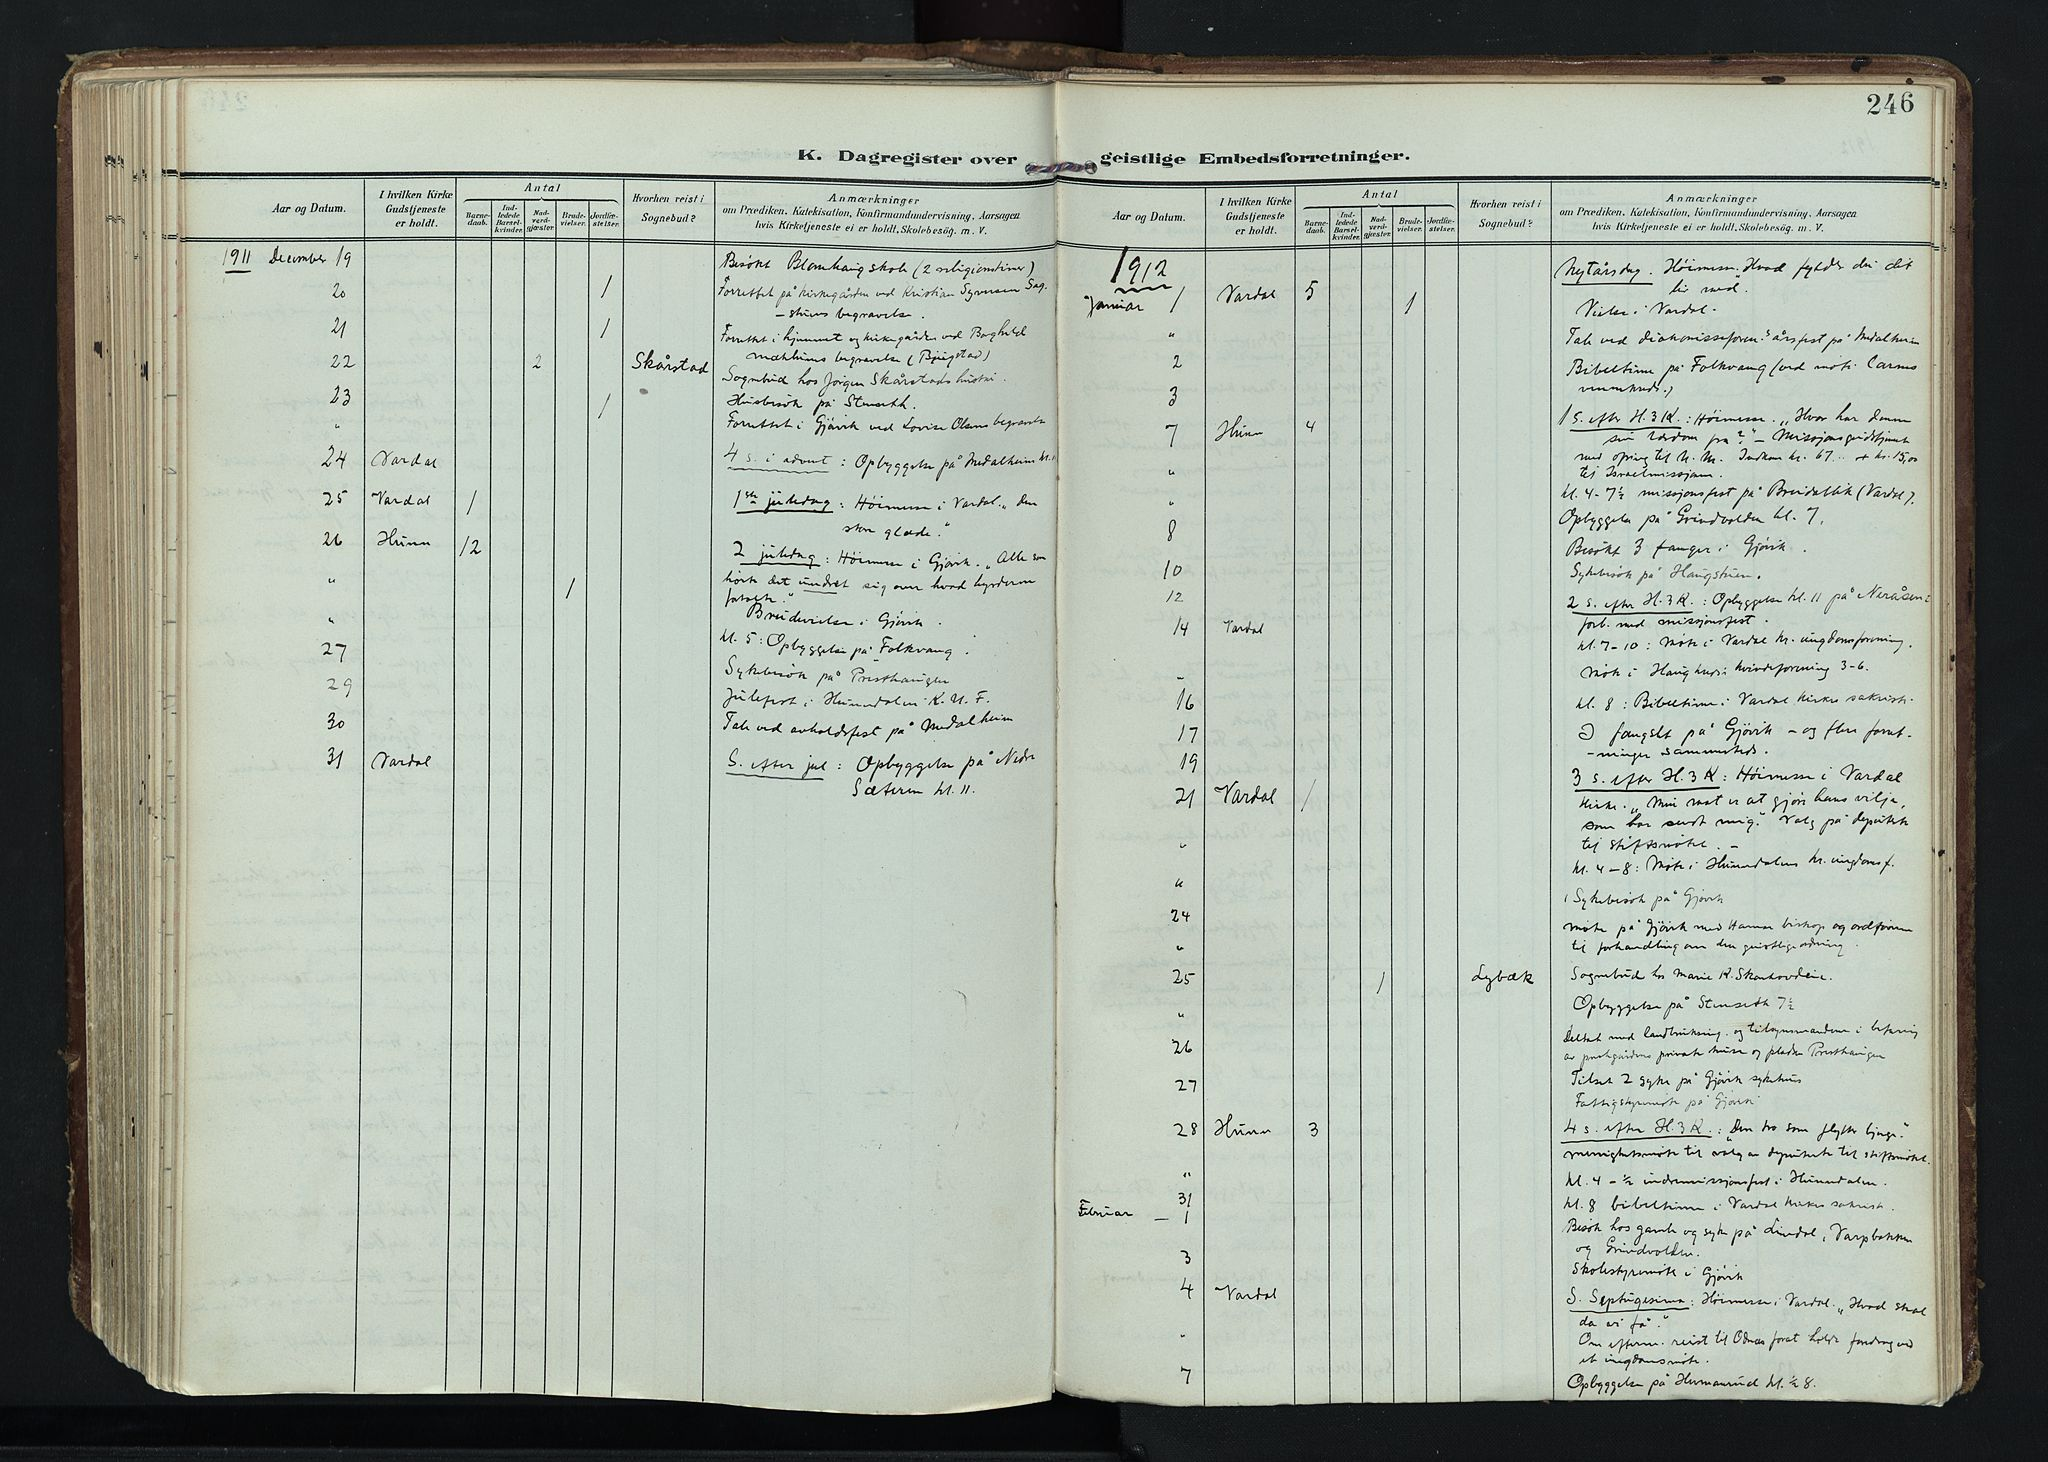 SAH, Vardal prestekontor, H/Ha/Haa/L0020: Ministerialbok nr. 20, 1907-1921, s. 246